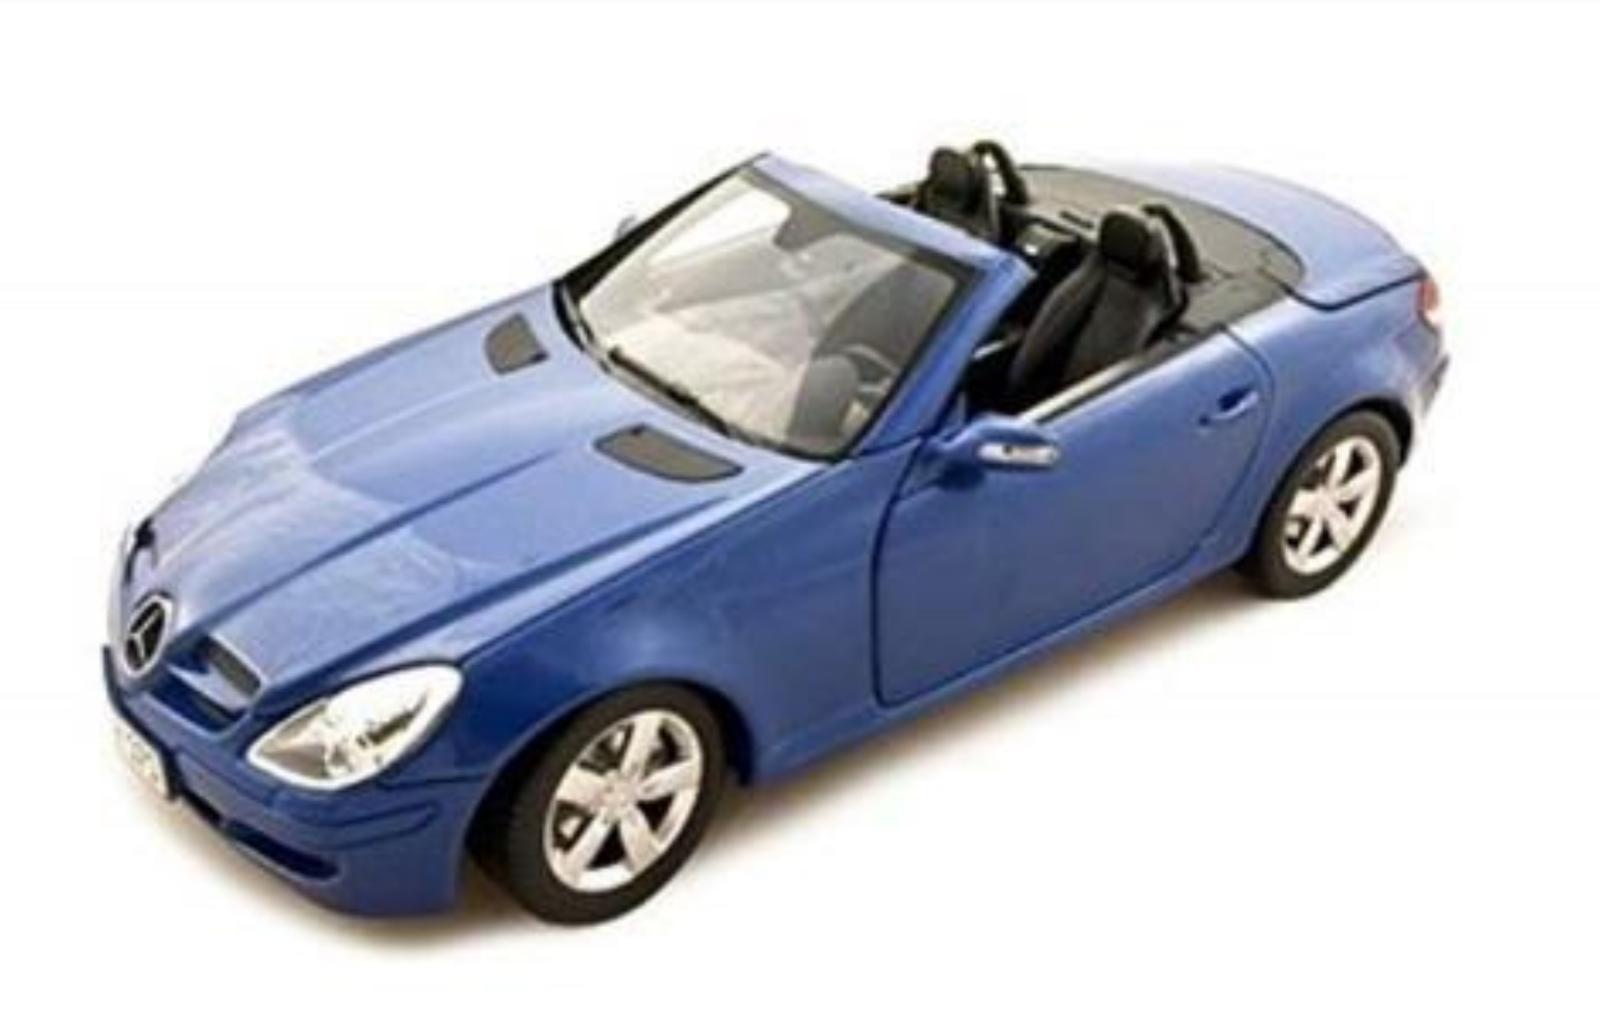 1 18 Mercedes SLK 2004 1 18 • Minichamps 100033131